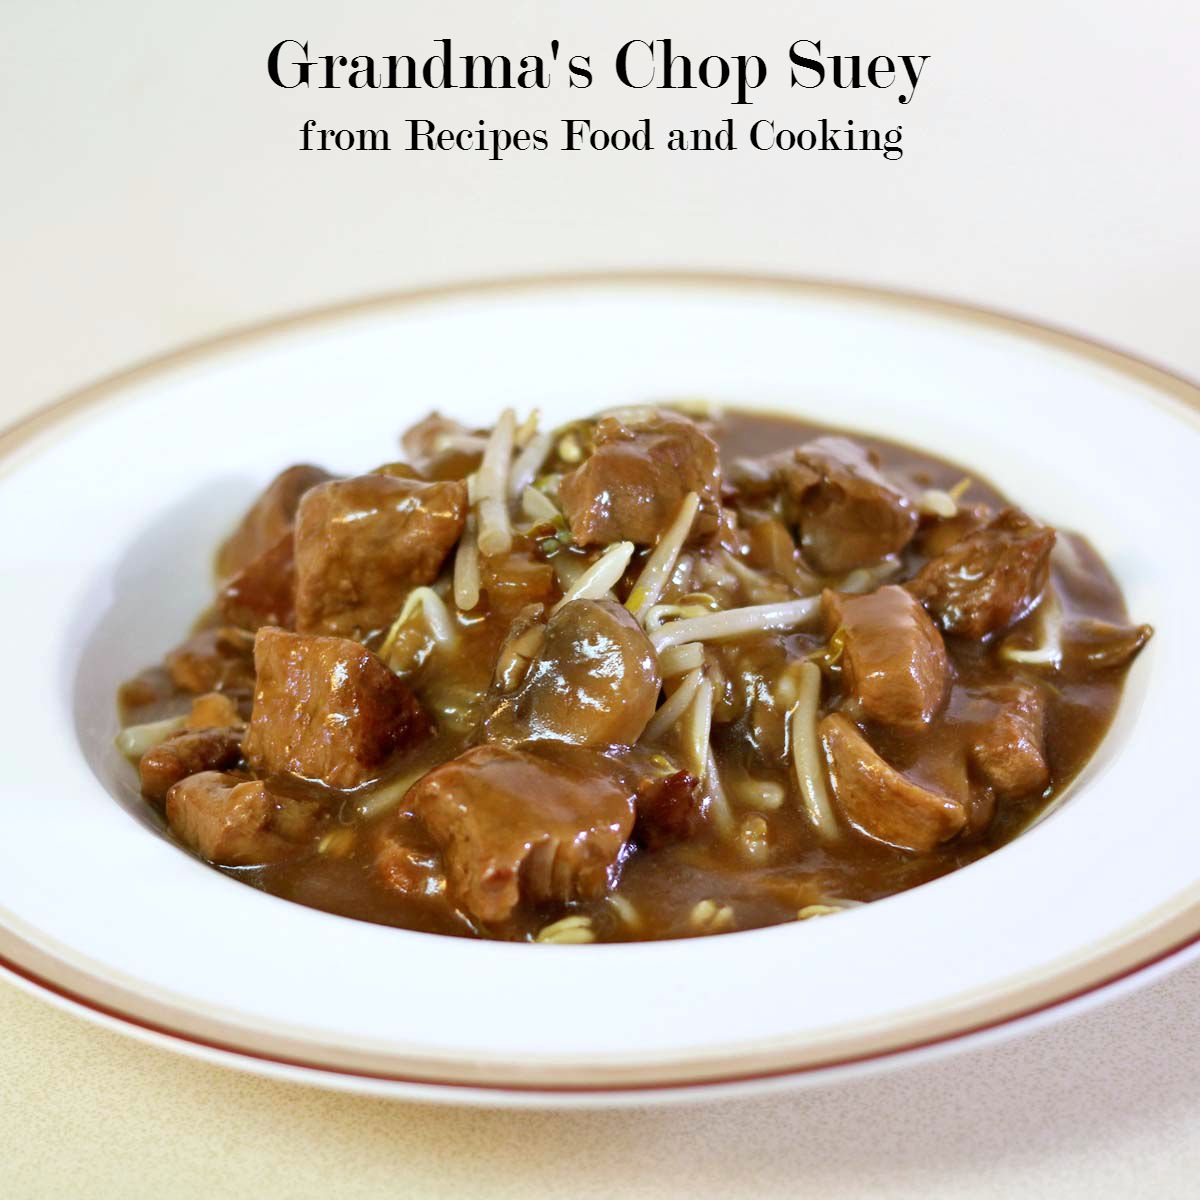 Grandma's Chop Suey